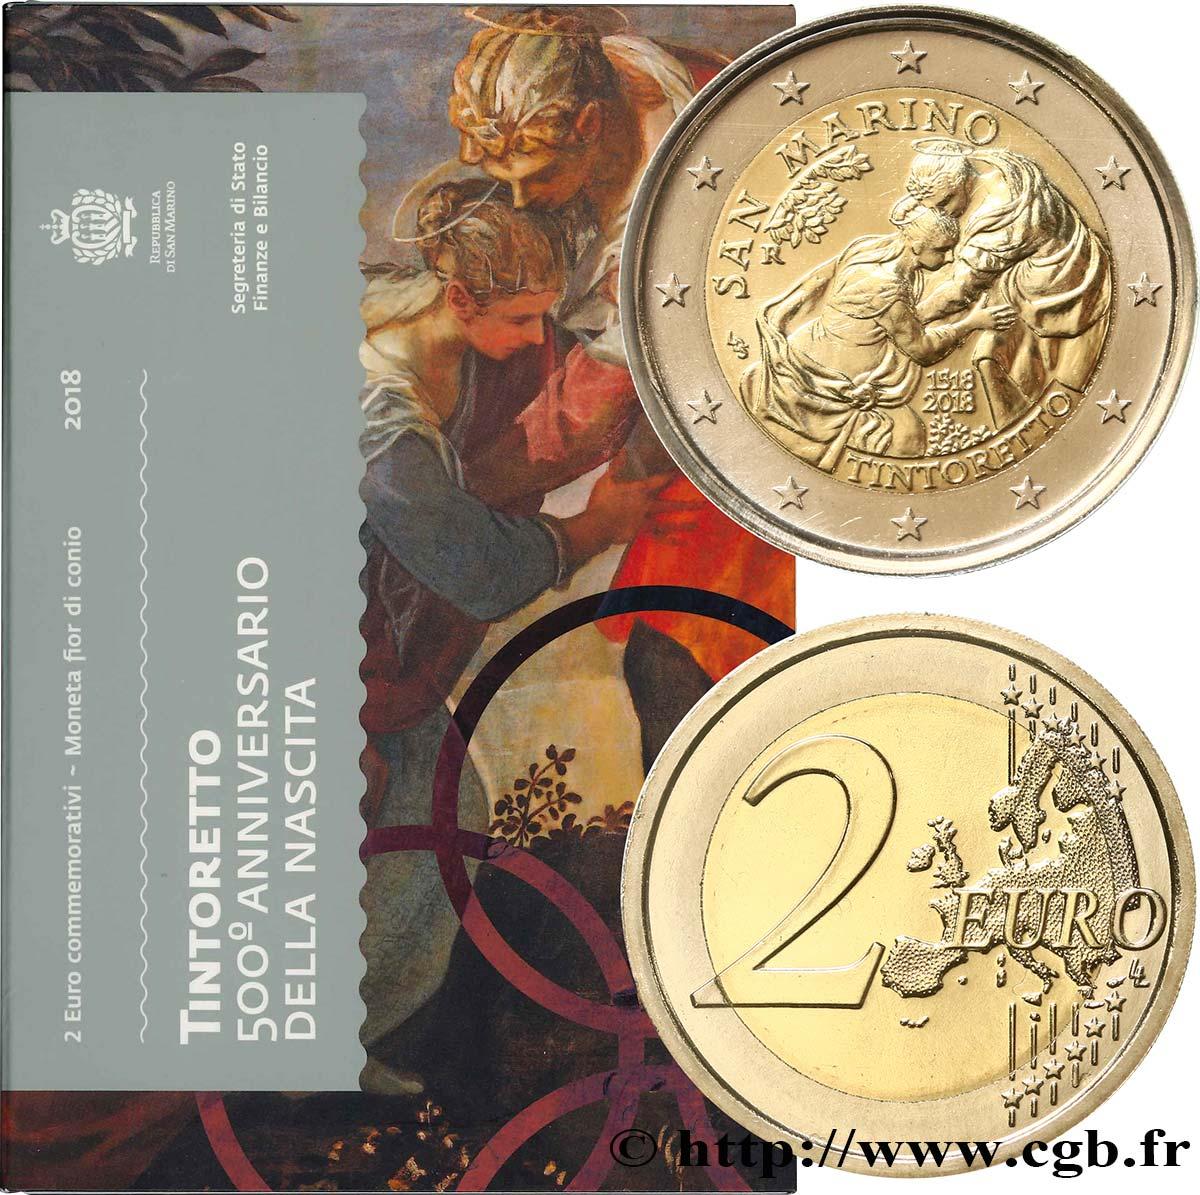 San Marino 2 Euro Le Tintoret 2018 Rome Feu496619 Euro Münzen